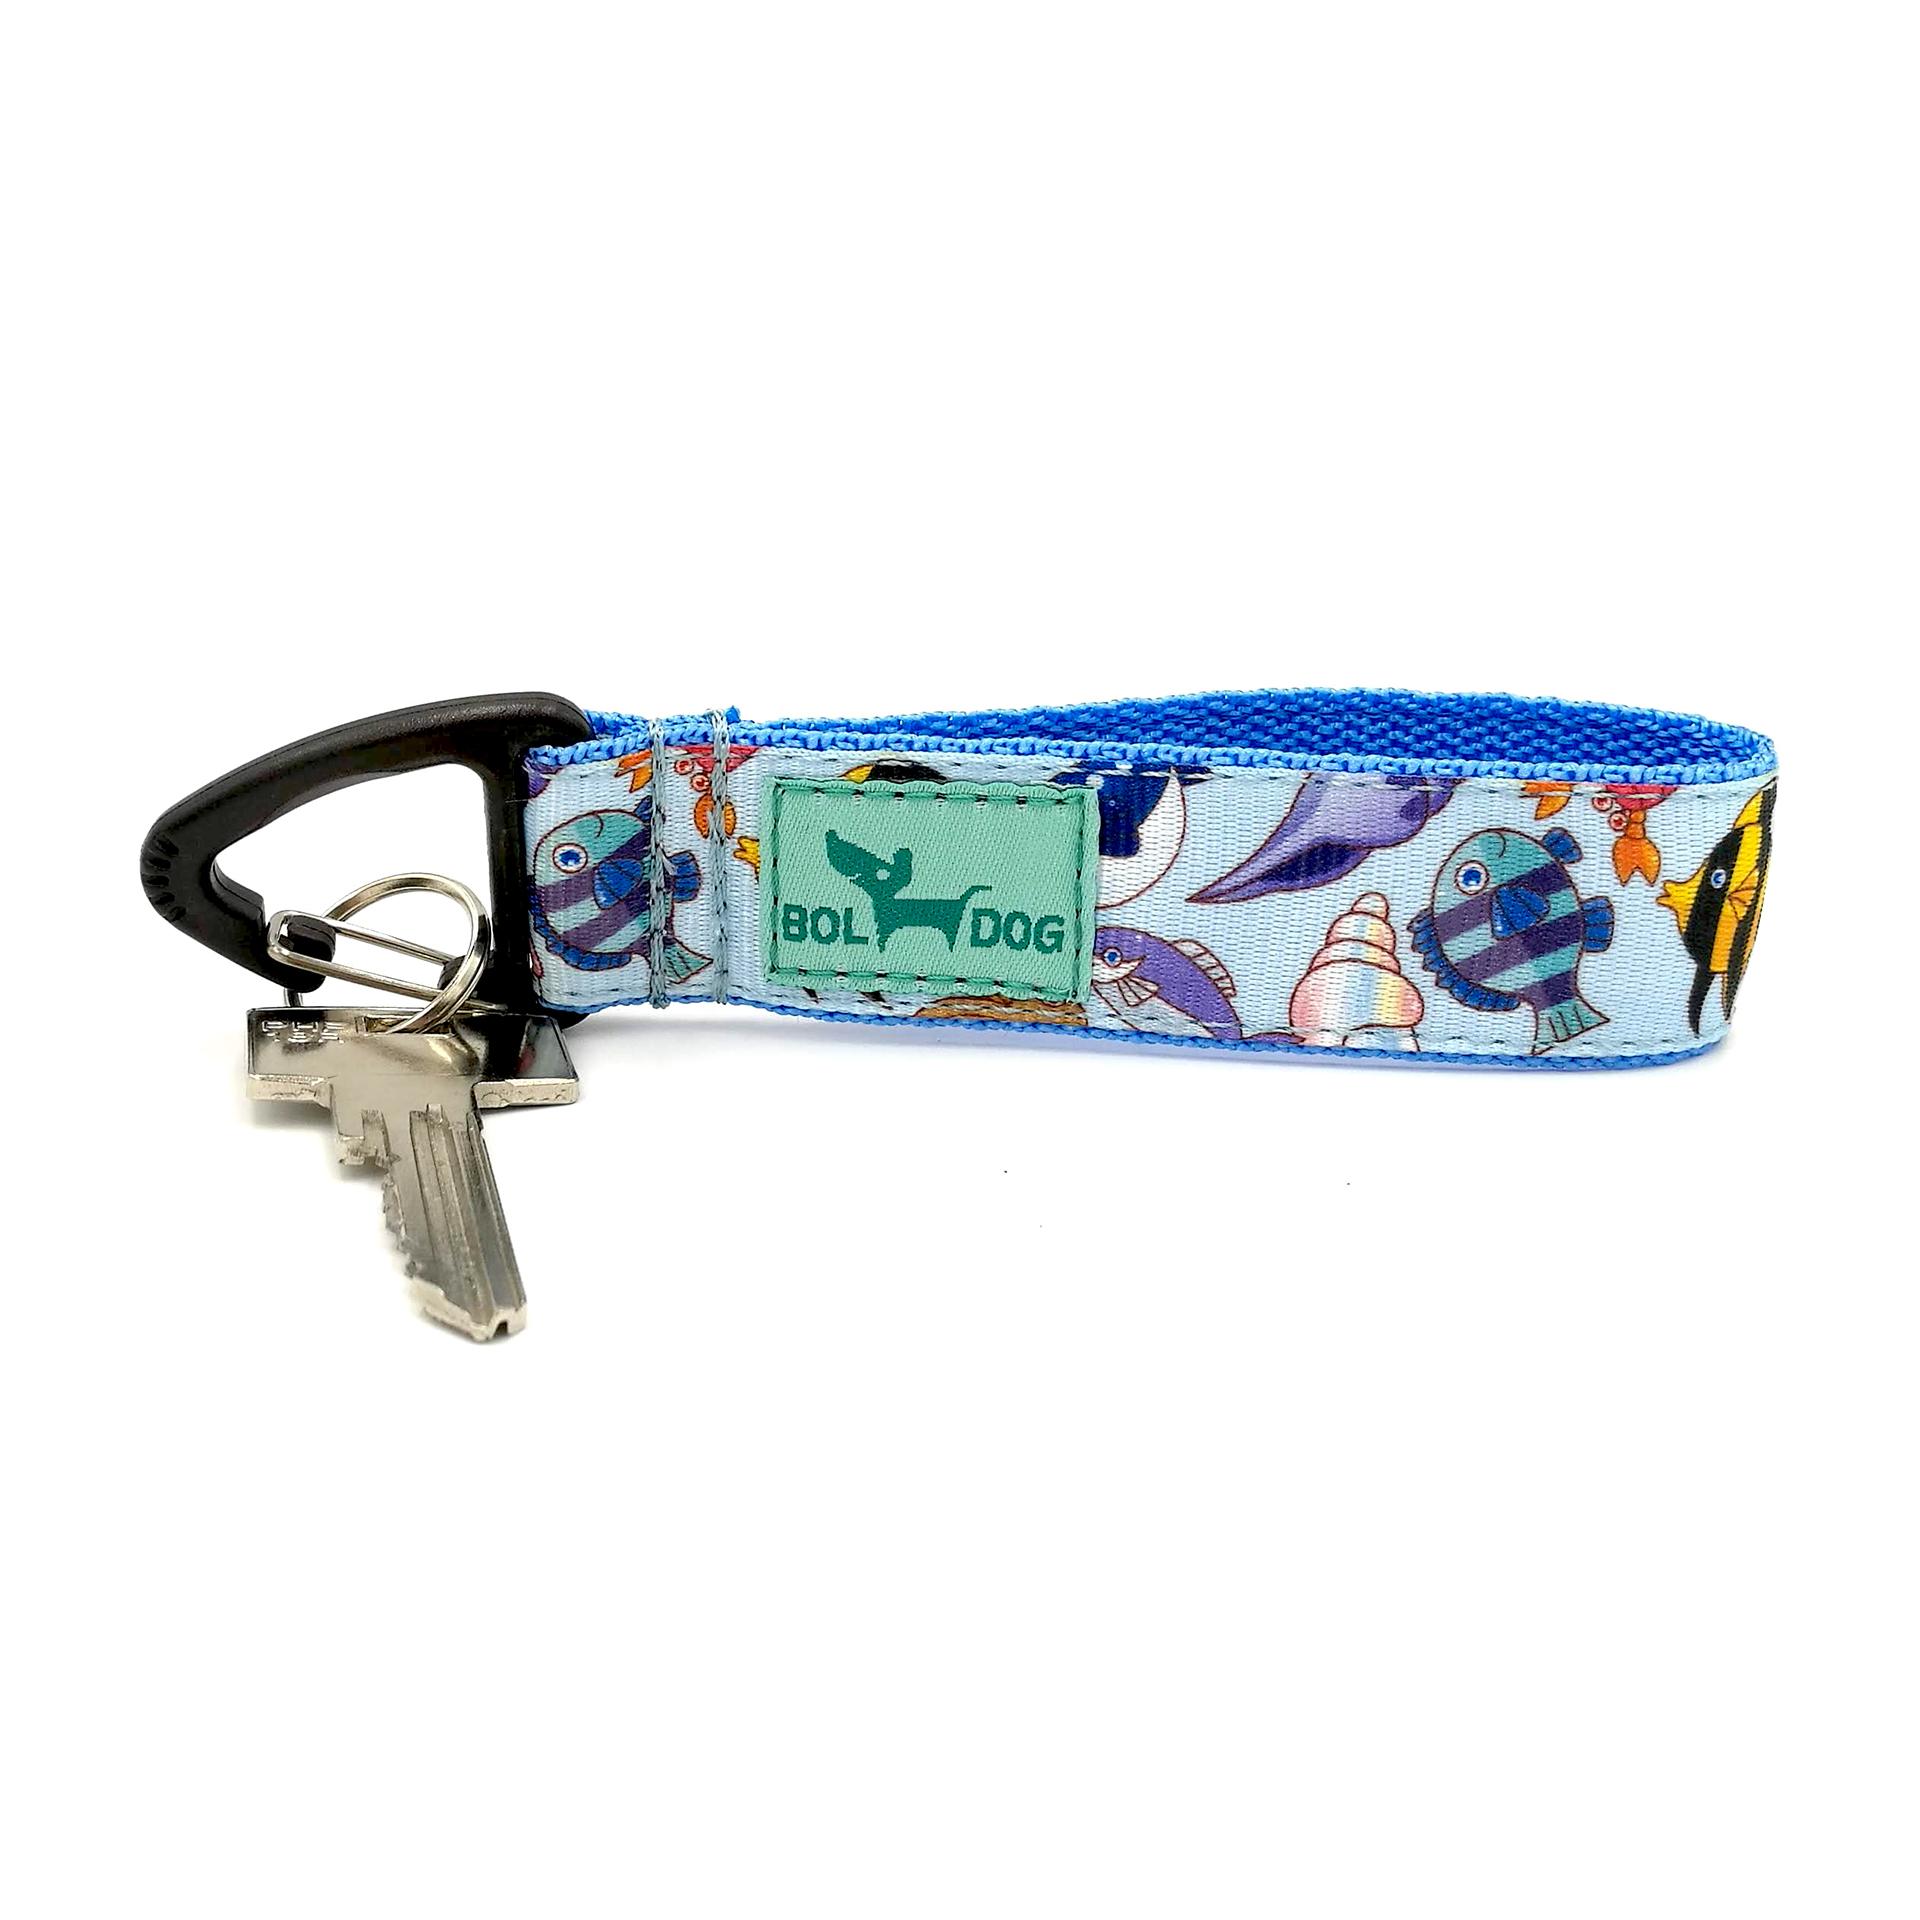 fish patterned key holder